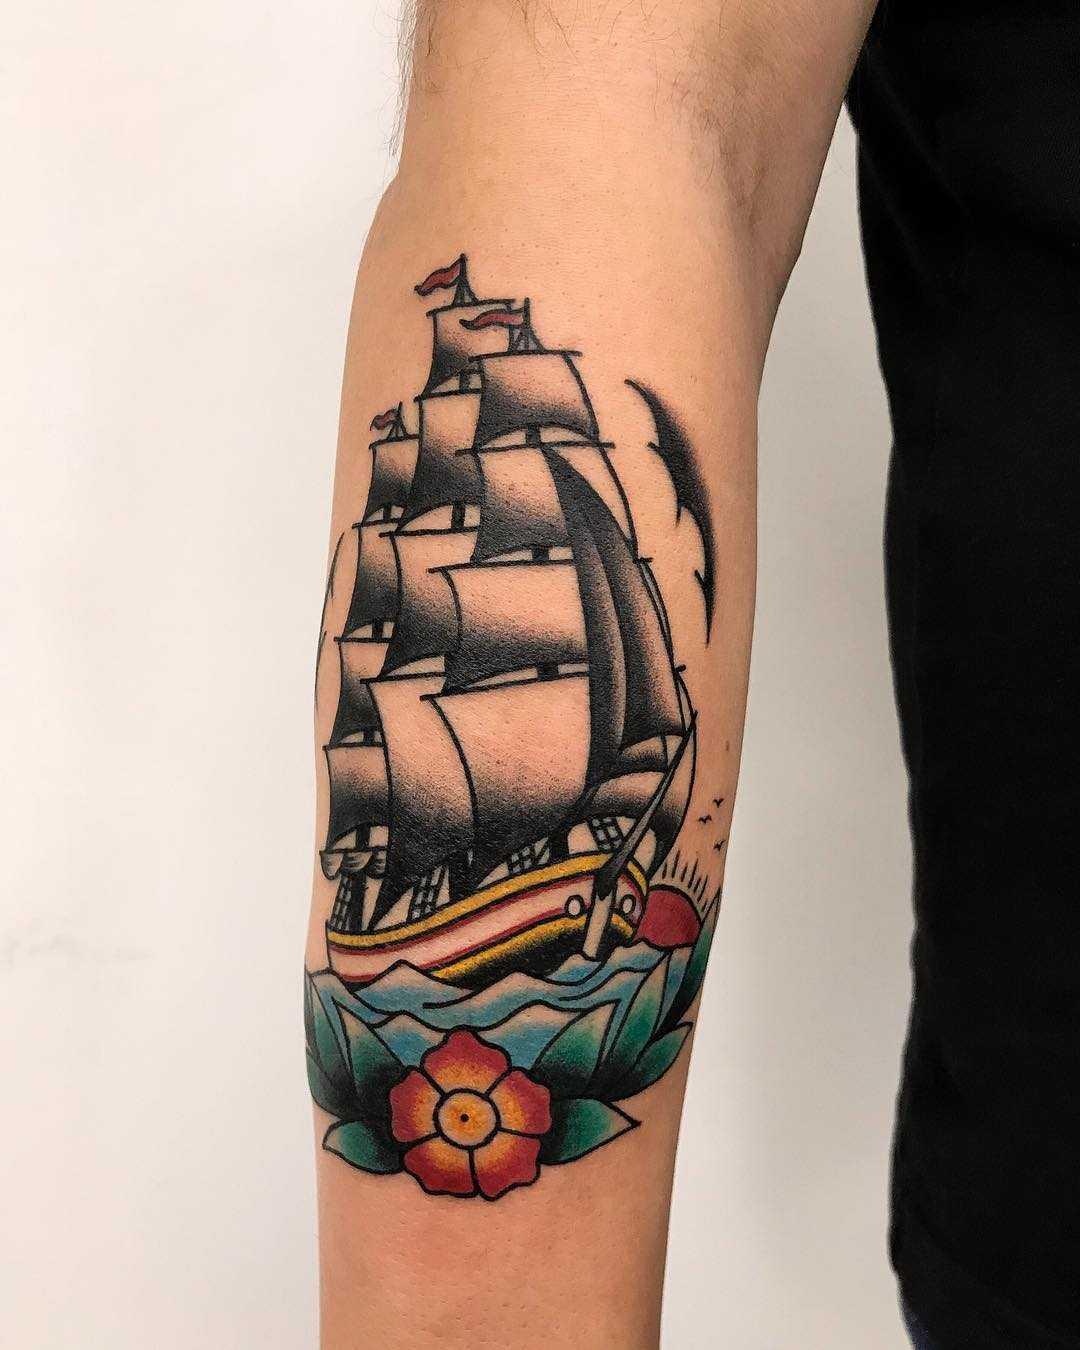 Traditional ship by Łukasz Krupiński